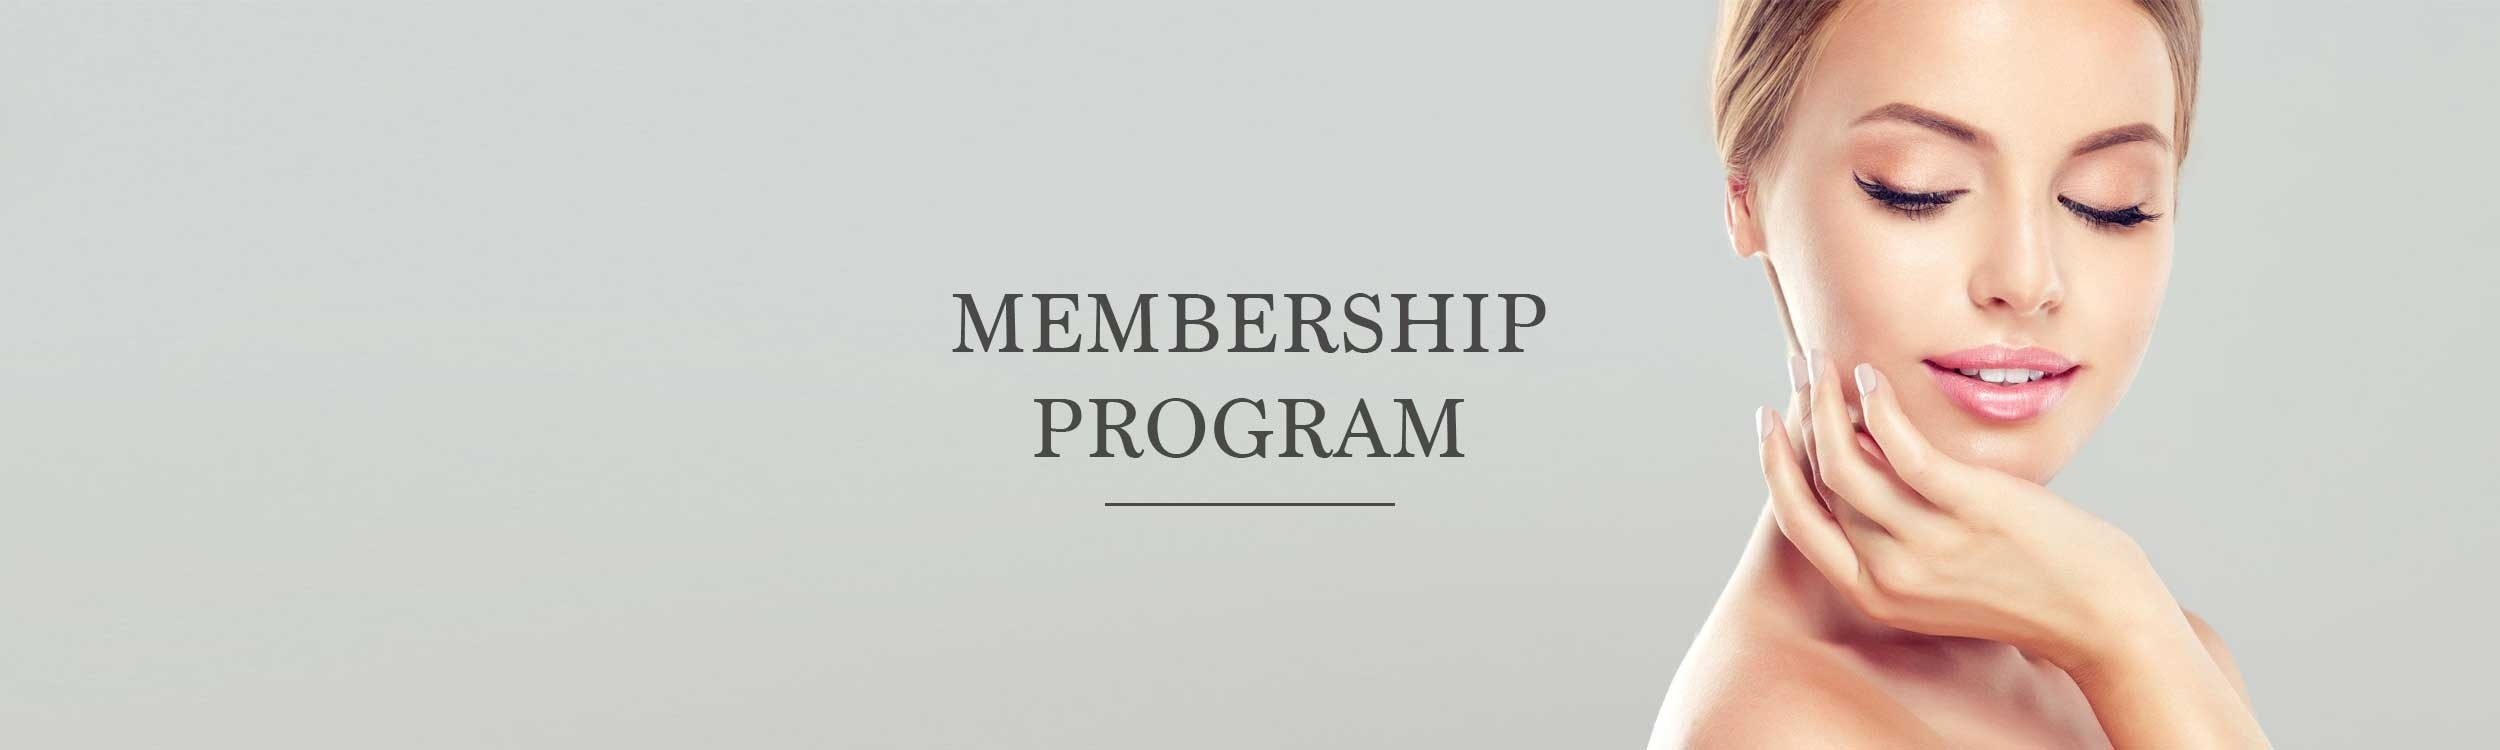 Membership-Program.jpg